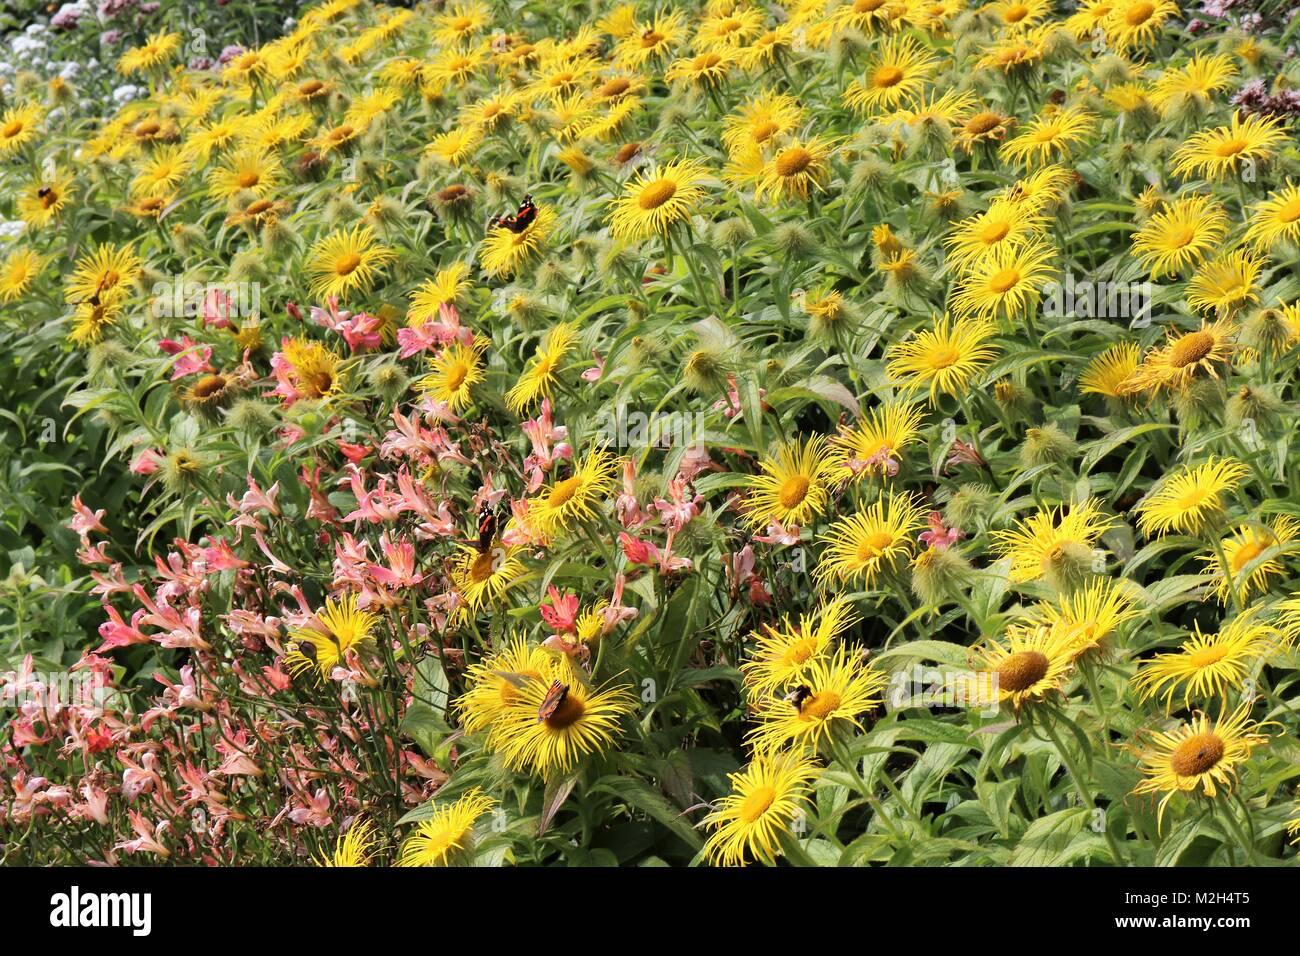 Flowers, plants, ornamental features in Pitmedden Garden, near Ellon, Aberdeenshire, Scotland UK - Stock Image